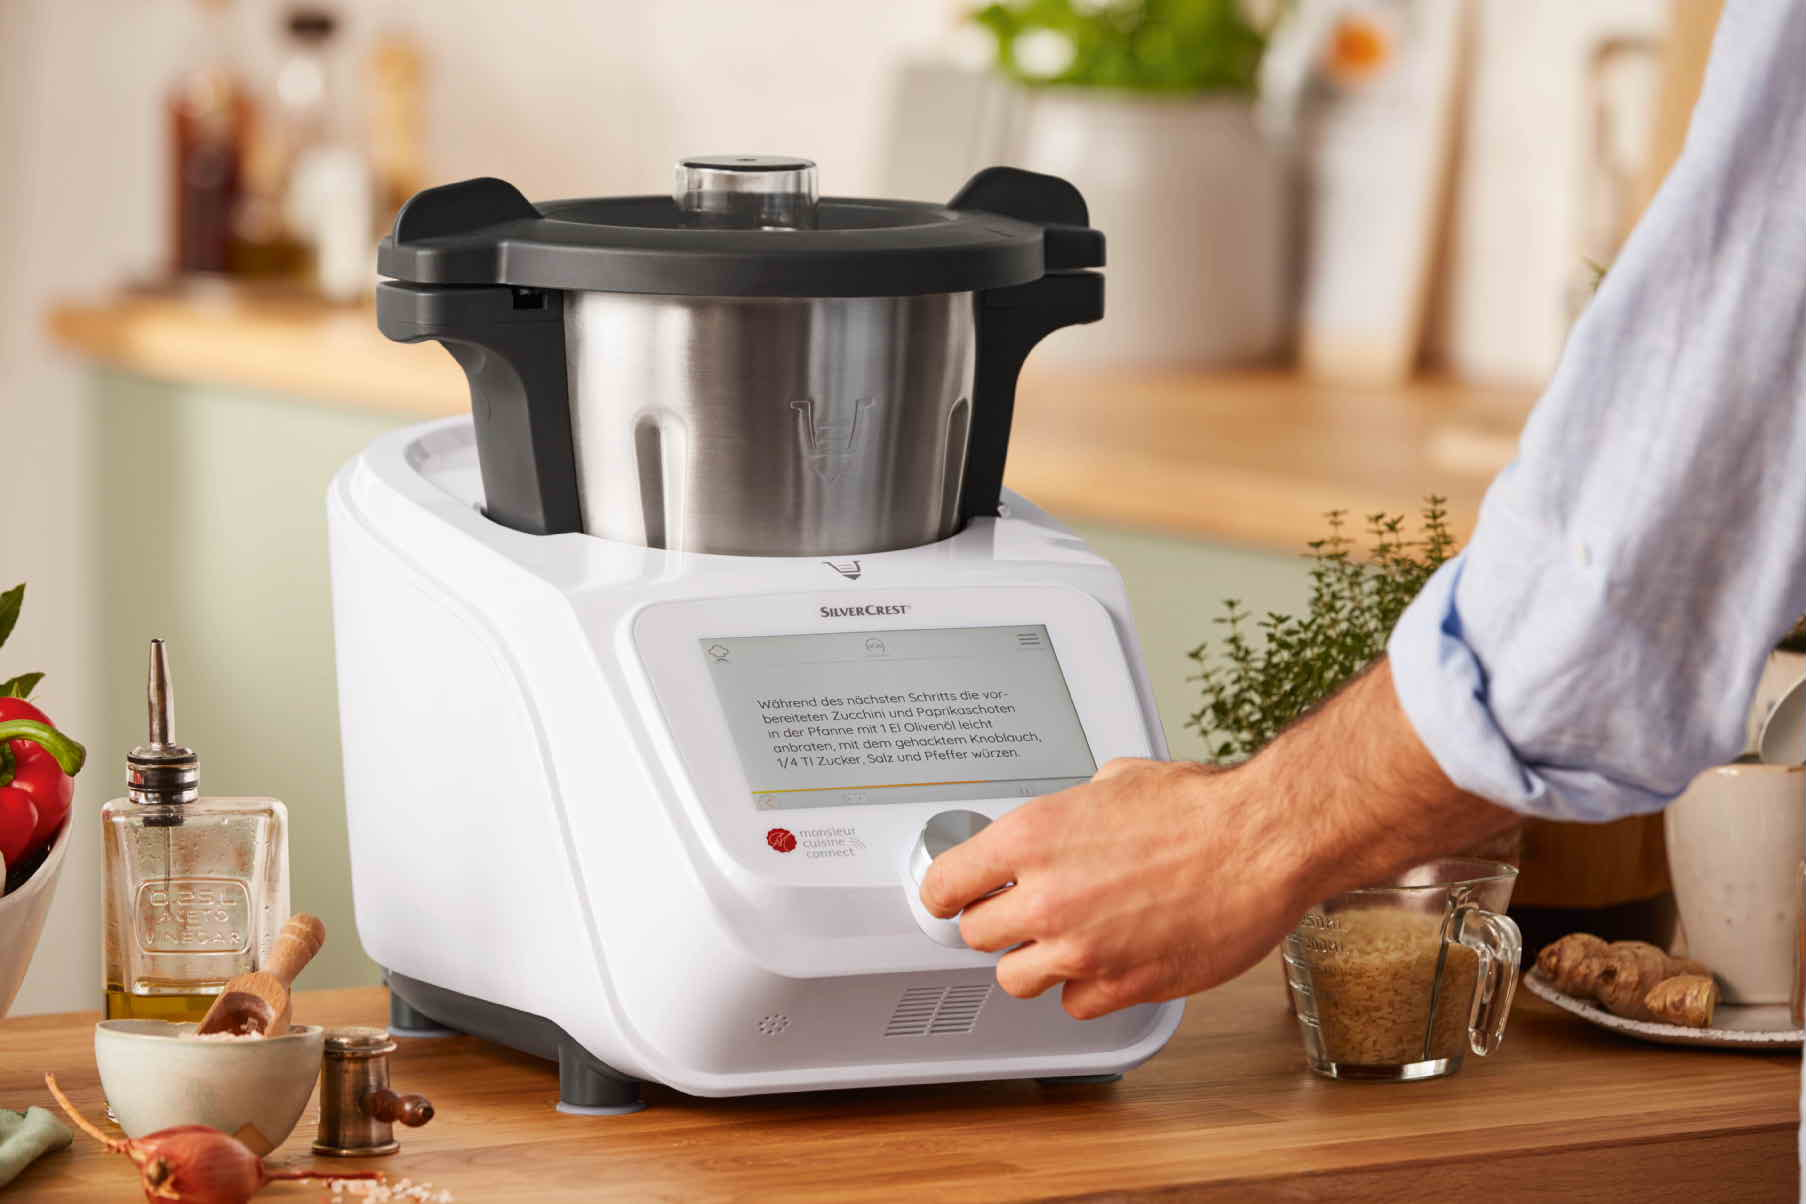 Que Robot De Cocina Comprar | Robot De Cocina Monsieur Cuisine Connect Lidl Tienda Online